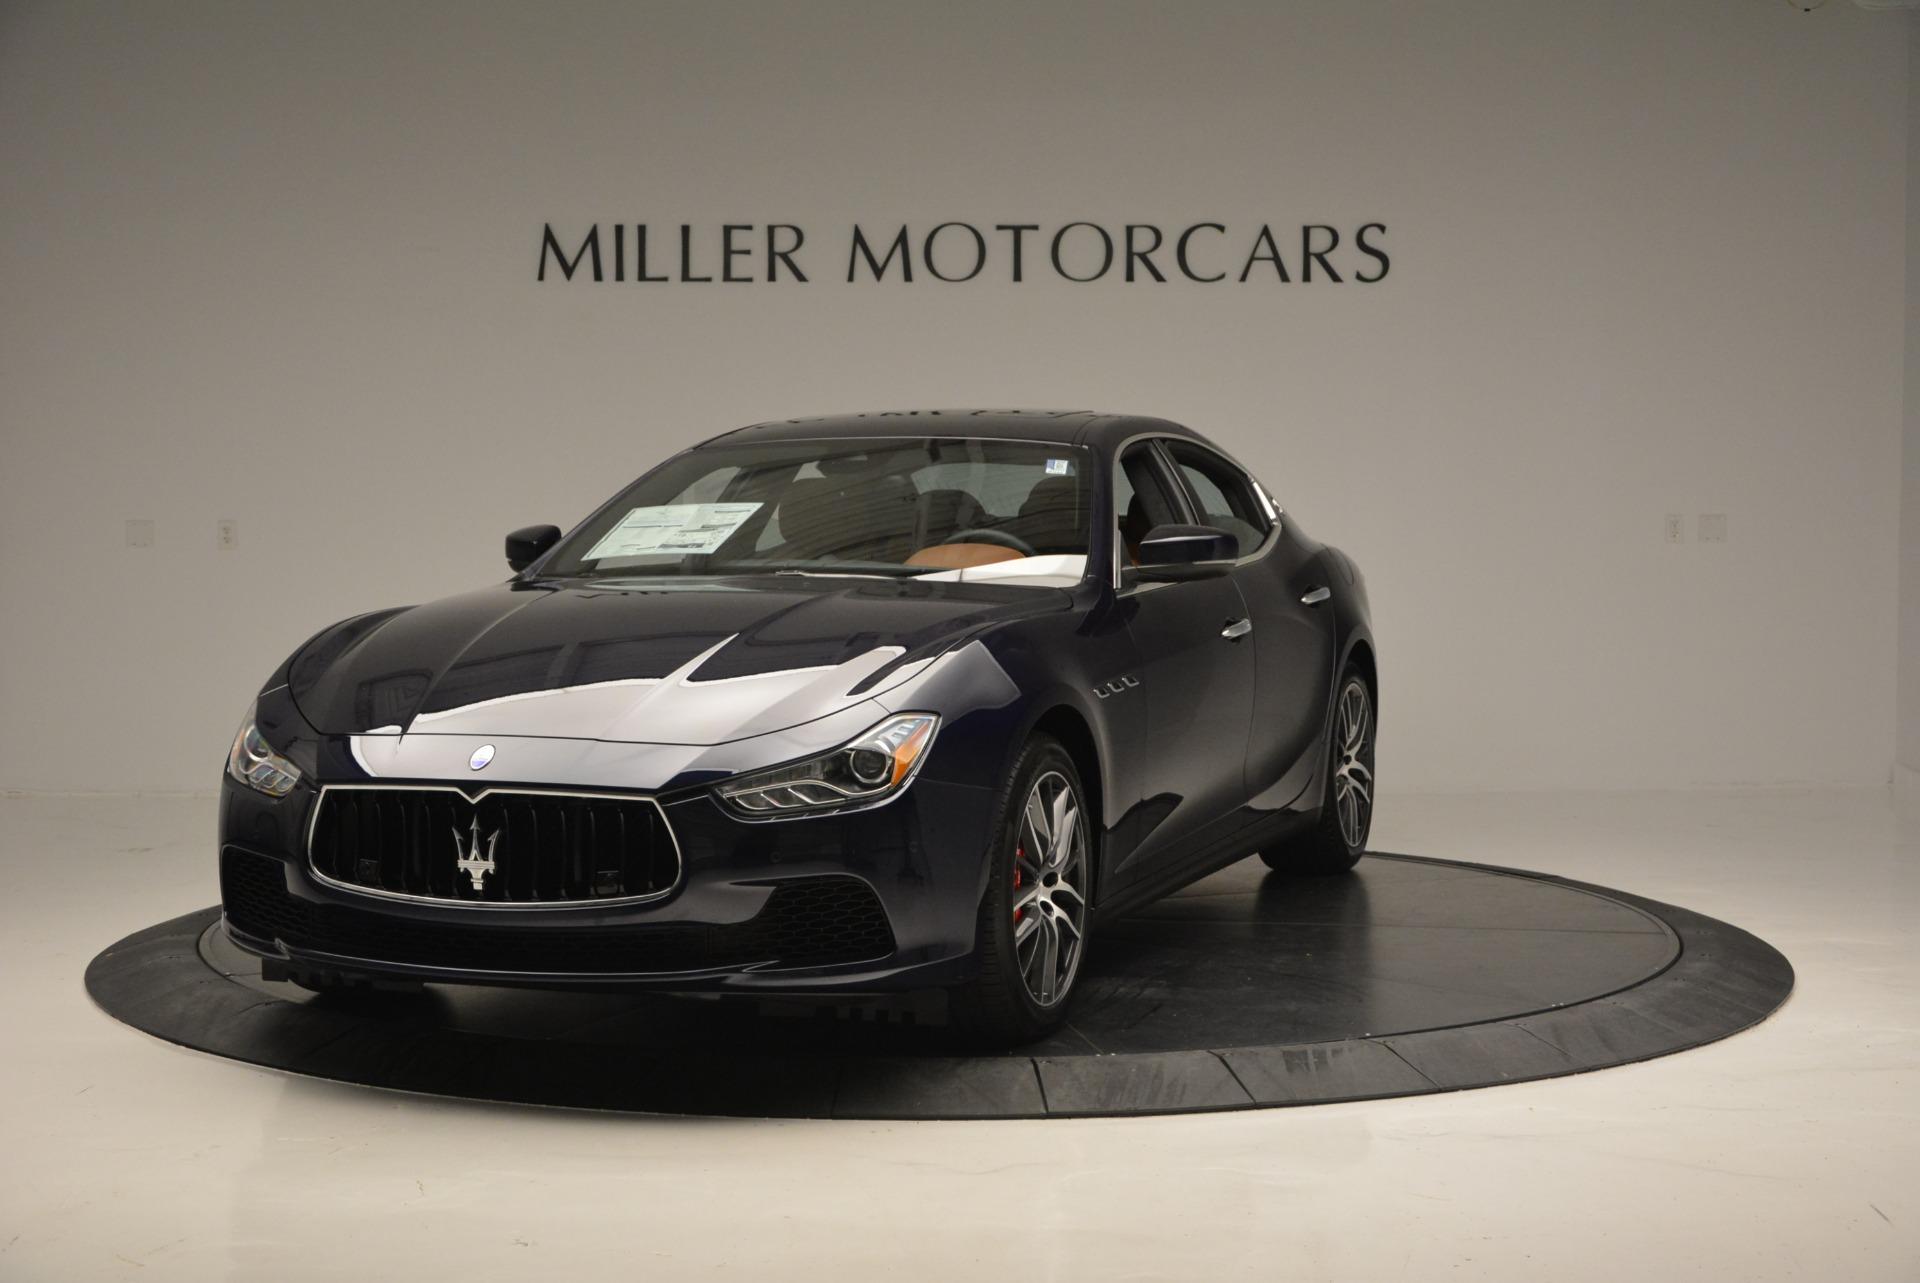 New 2017 Maserati Ghibli S Q4 For Sale In Westport, CT 714_main